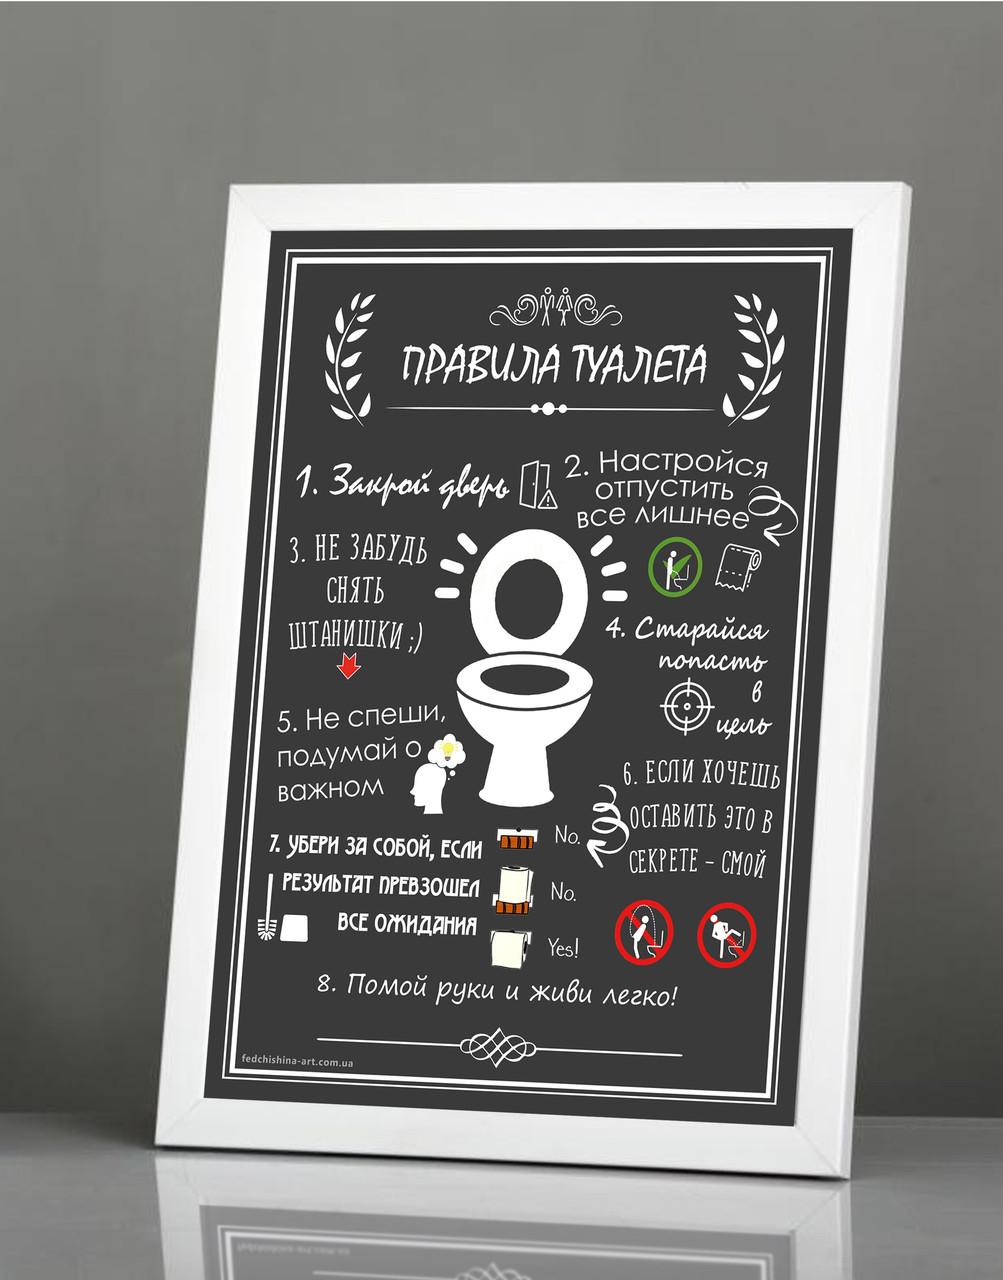 Плакат постер Правила туалета А4 в раме белой на стену на русском